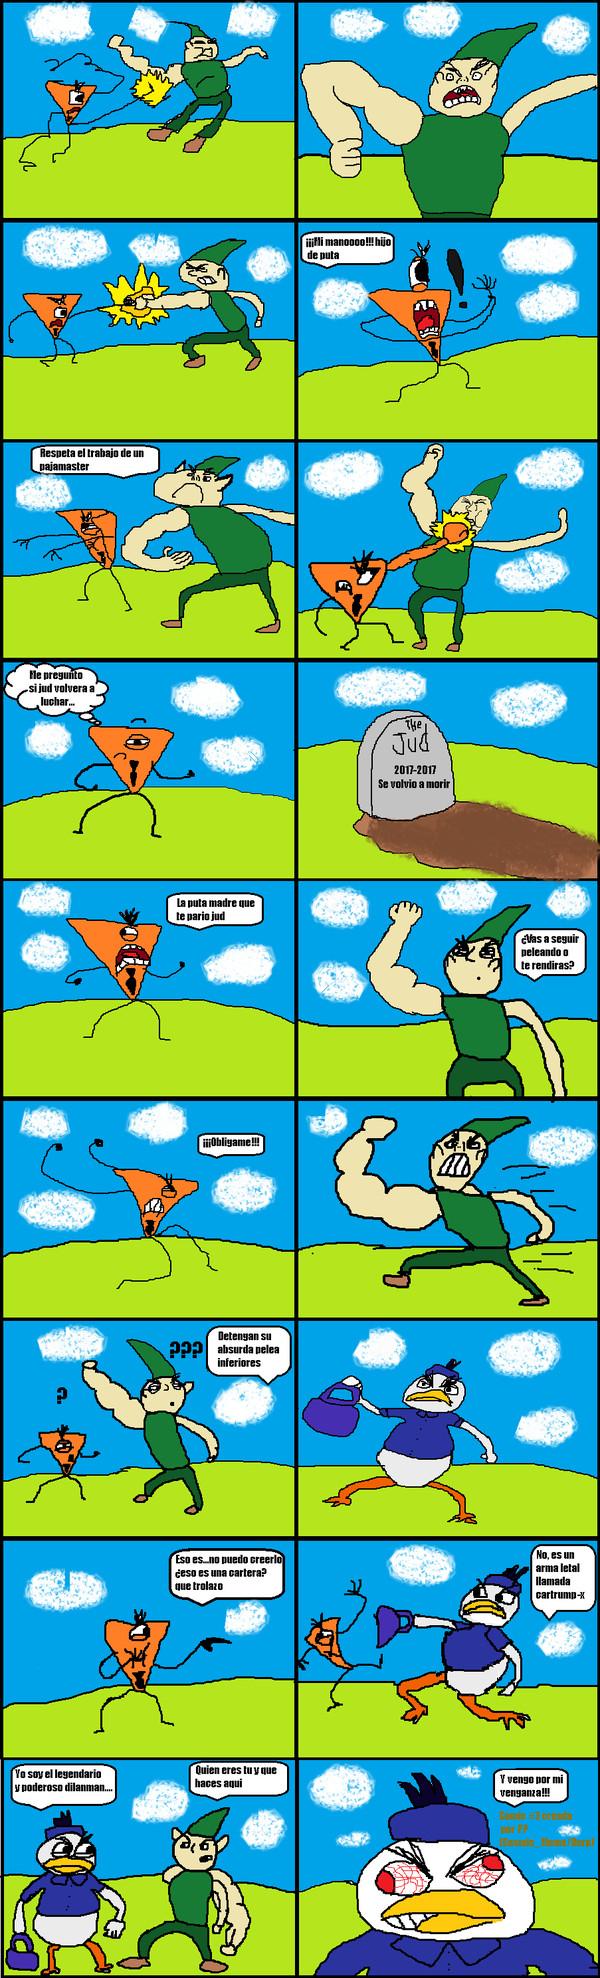 Otros - The Random Things Comic #3 Saga de Krad:El verdadero enemigo al fin aparece